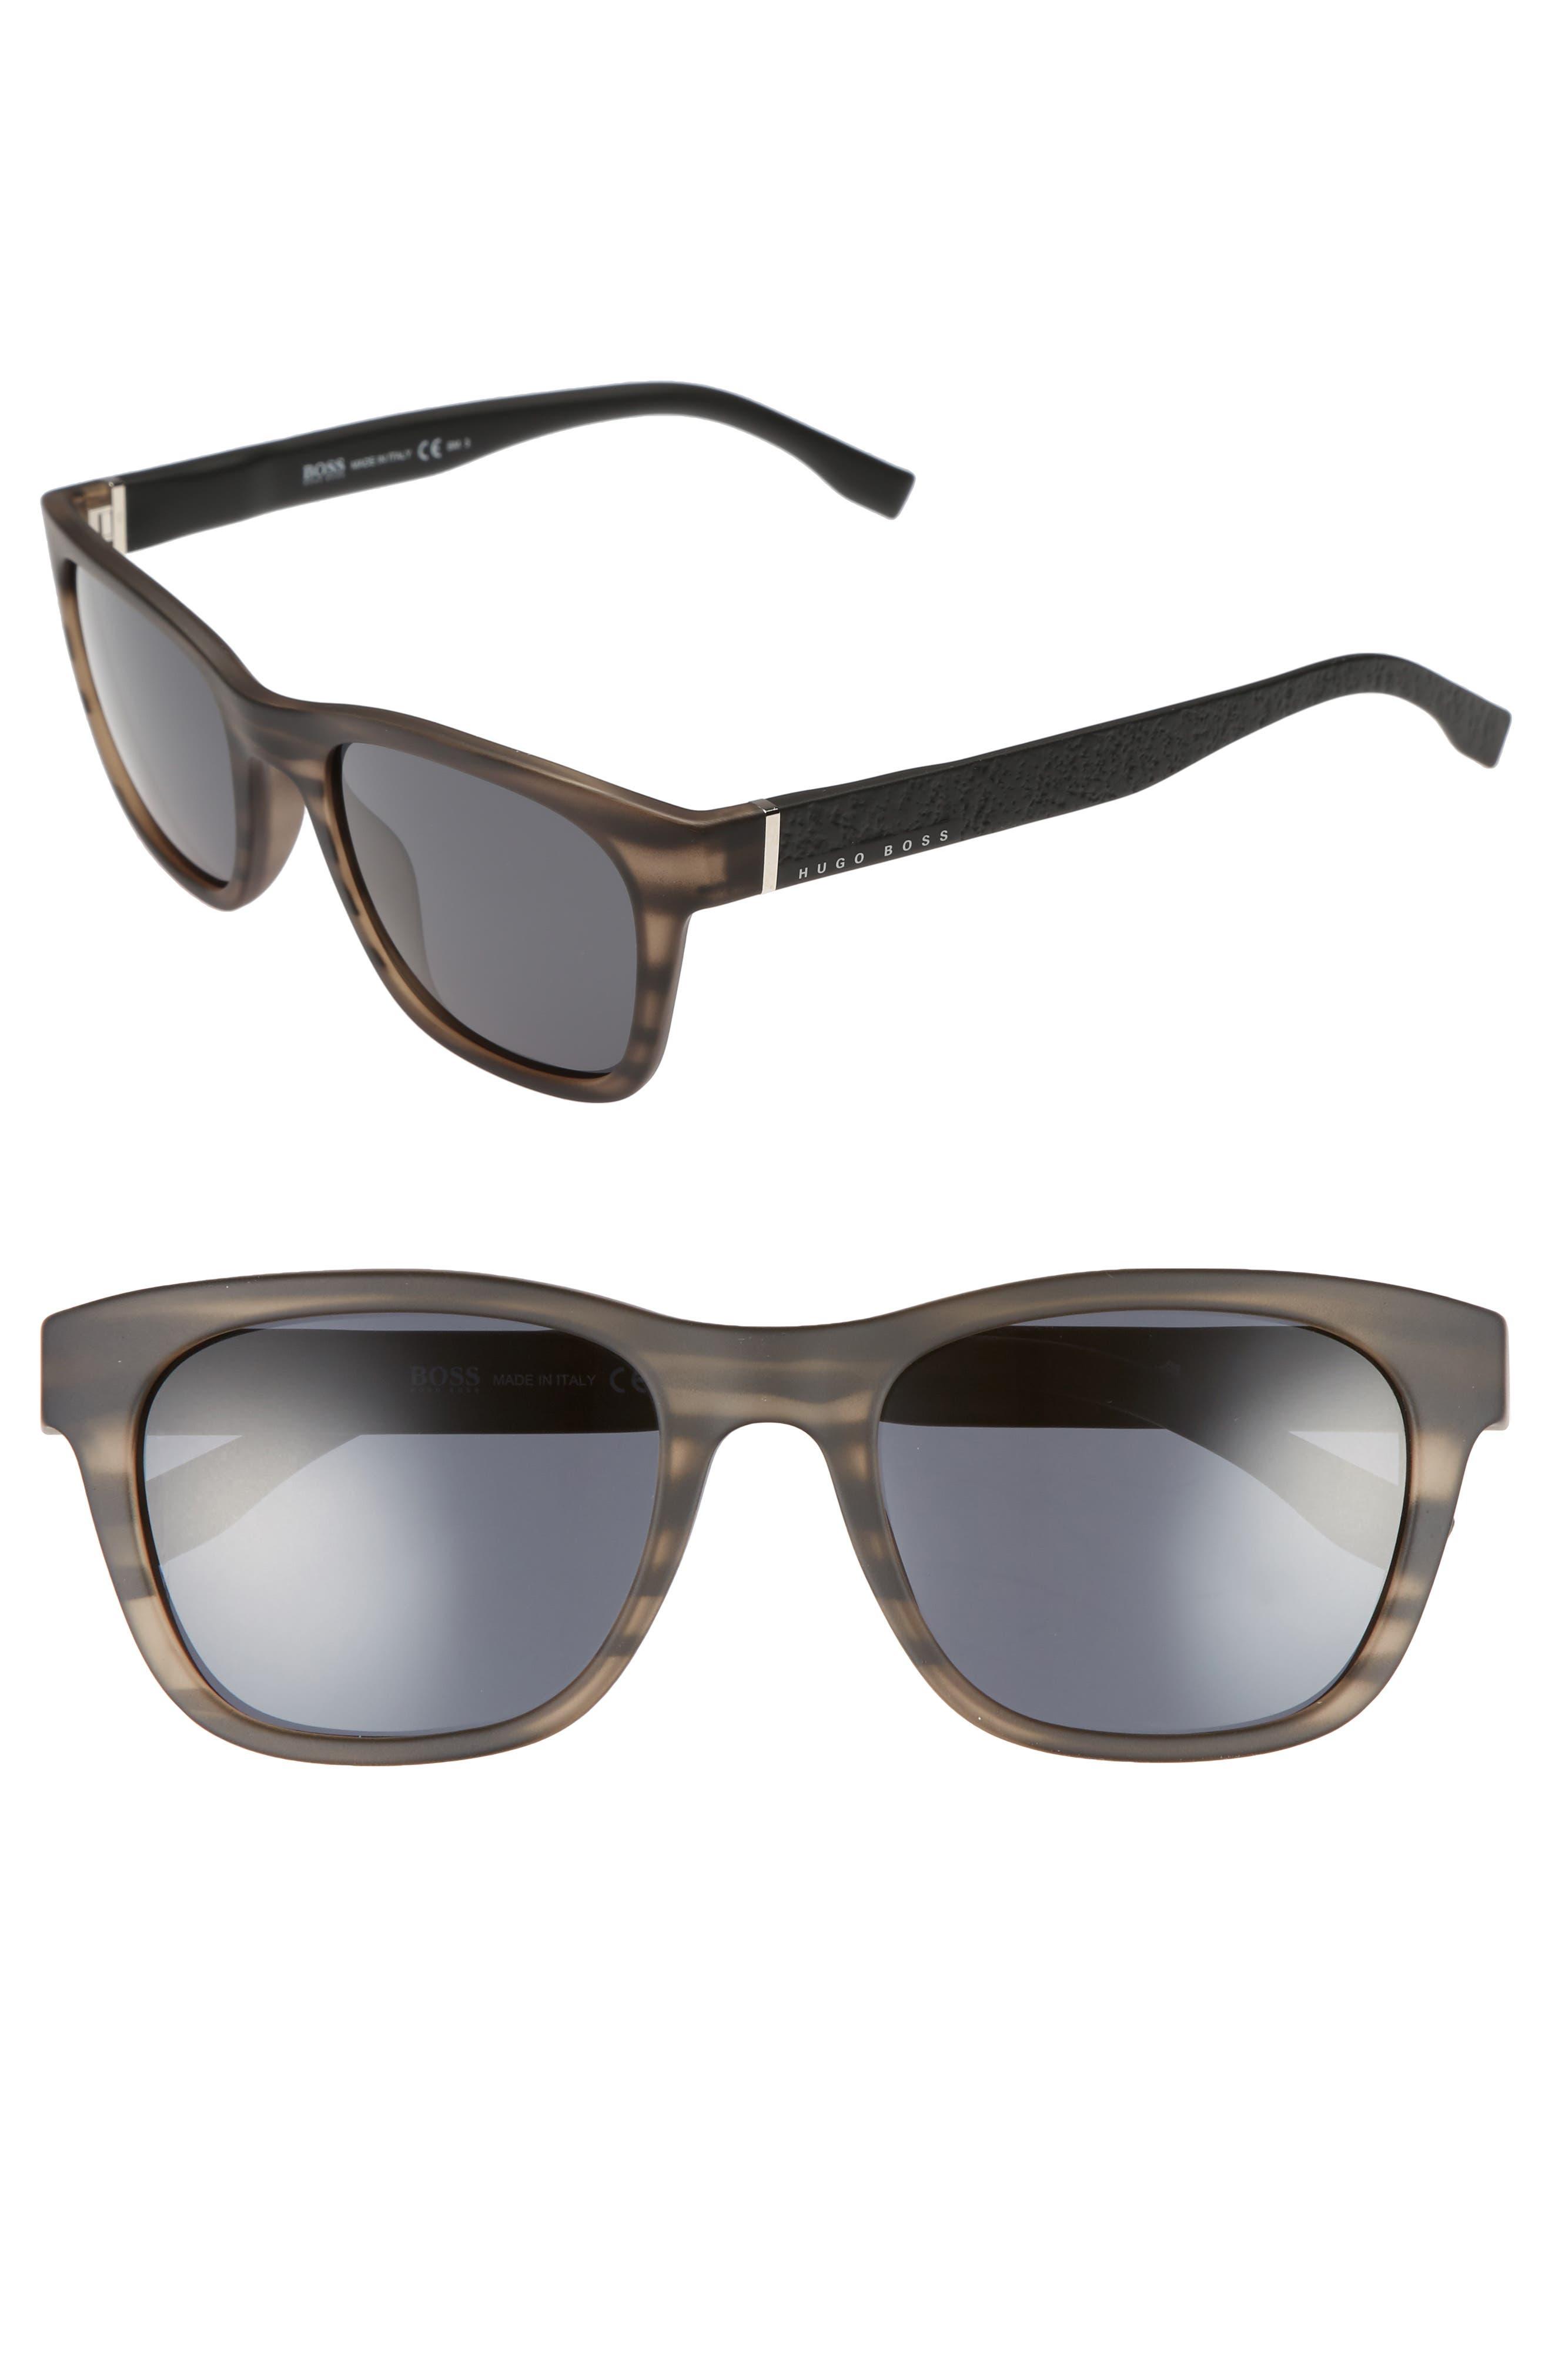 53mm Polarized Sunglasses,                         Main,                         color, Gray Horn Black/ Gray Blue